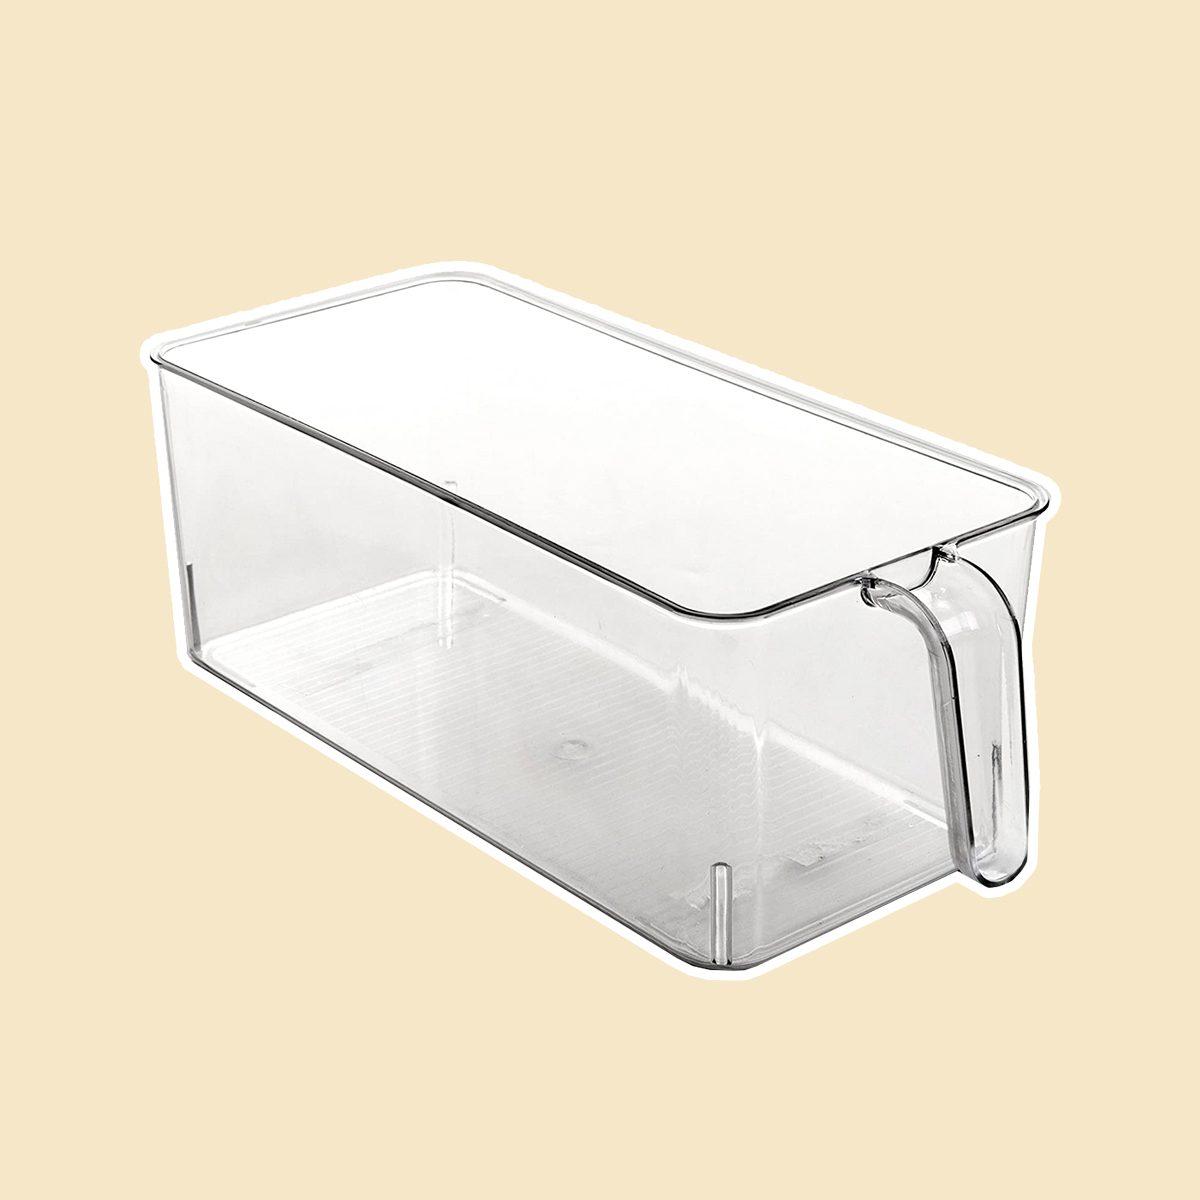 BINO Refrigerator, Freezer, Kitchen Pantry Cabinet Organizer Plastic Bin with Handle, Clear Plastic Storage Bins Refrigerator Organizer Bins Fridge...